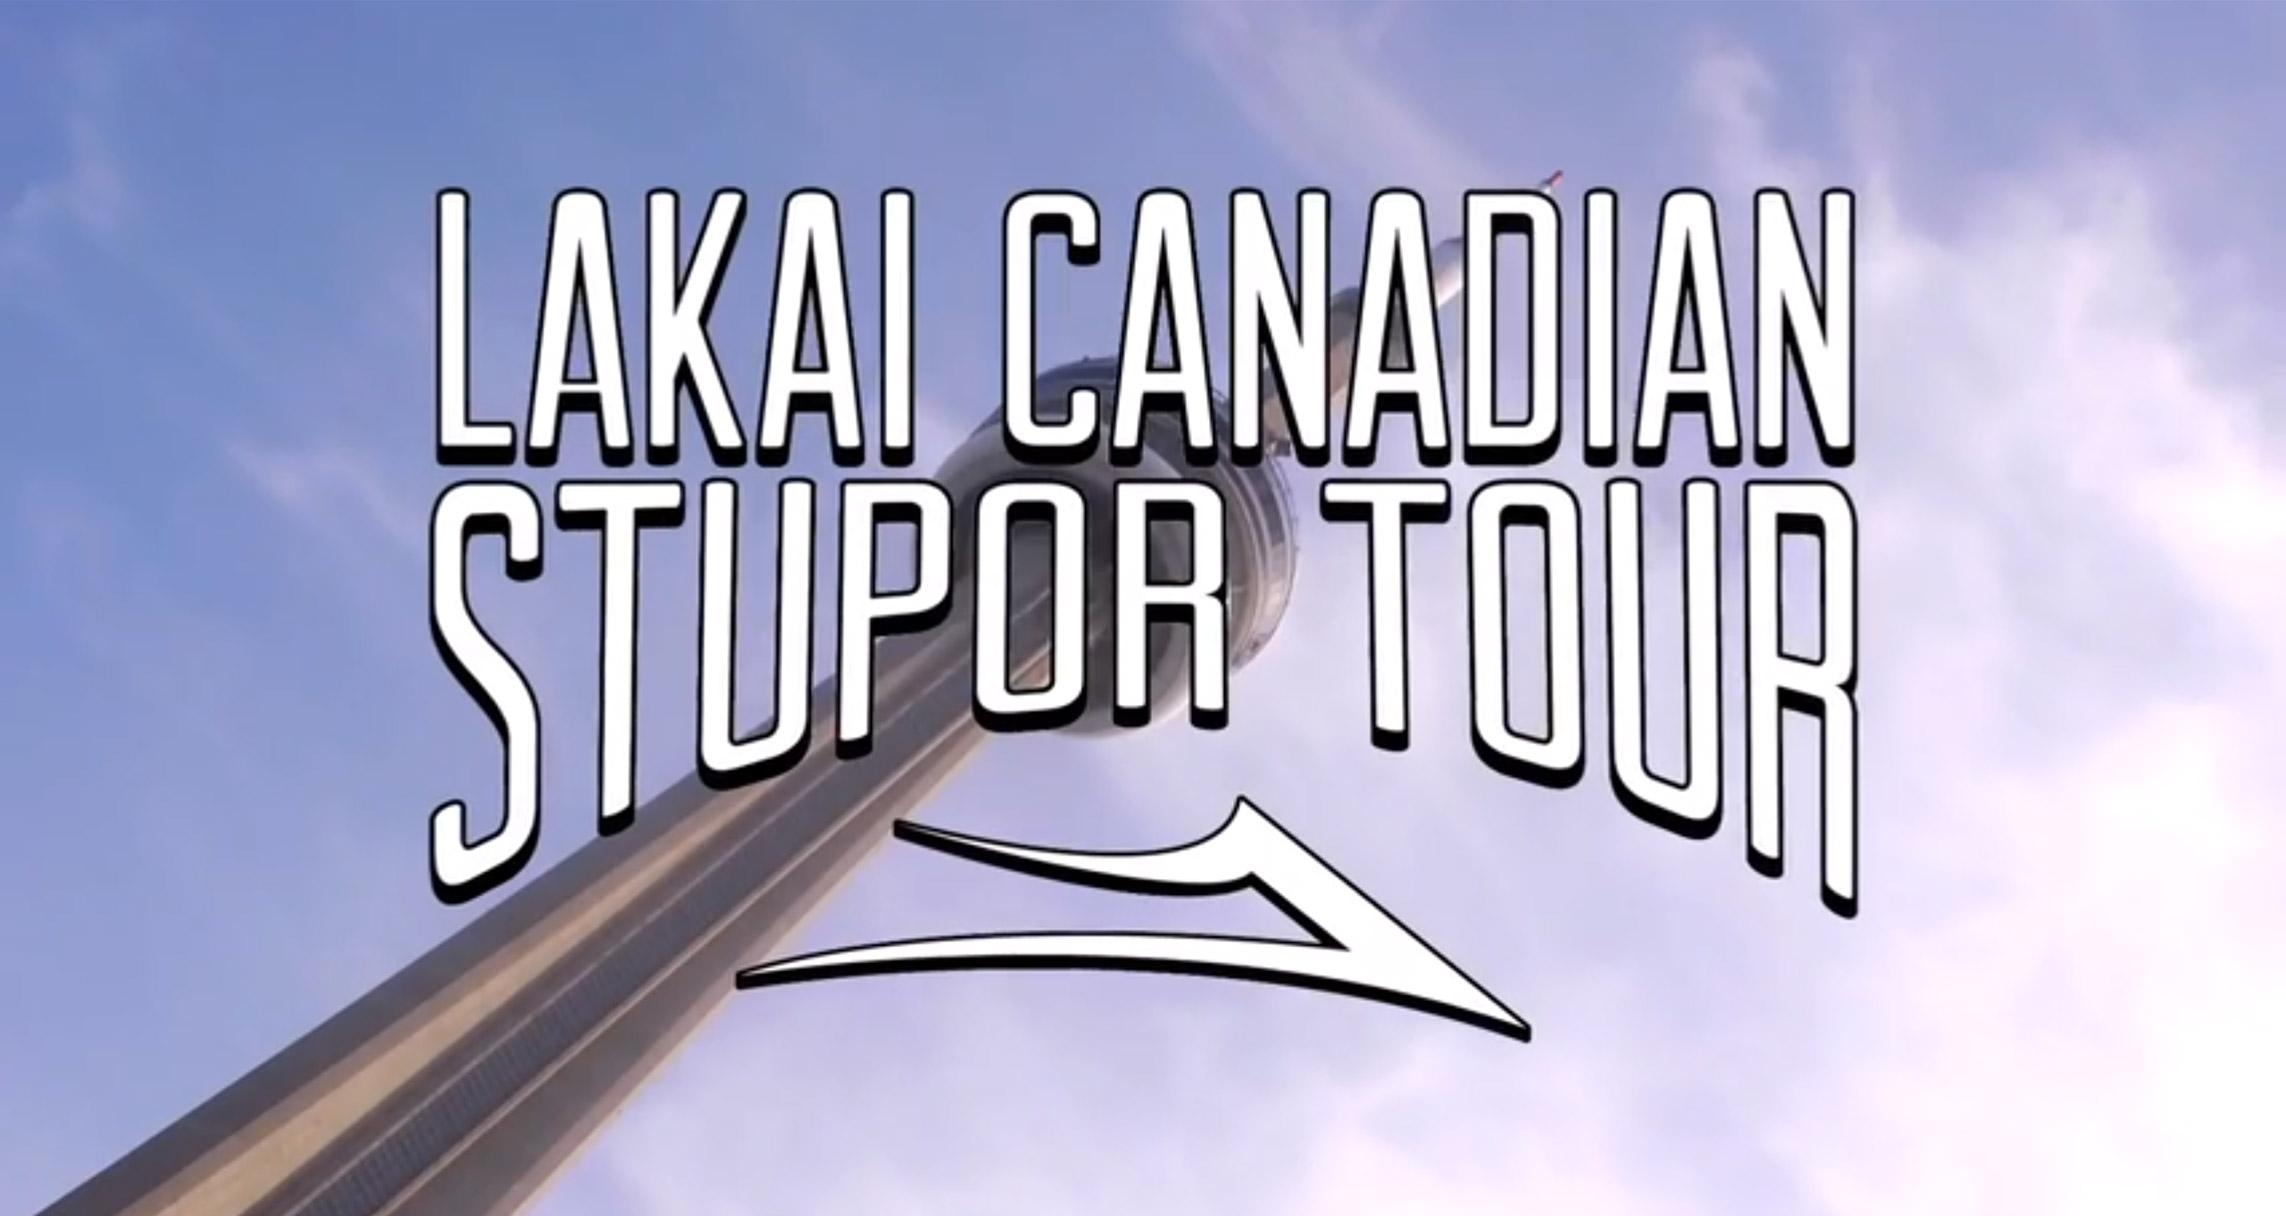 Lakai Canadian Stupor Tour.